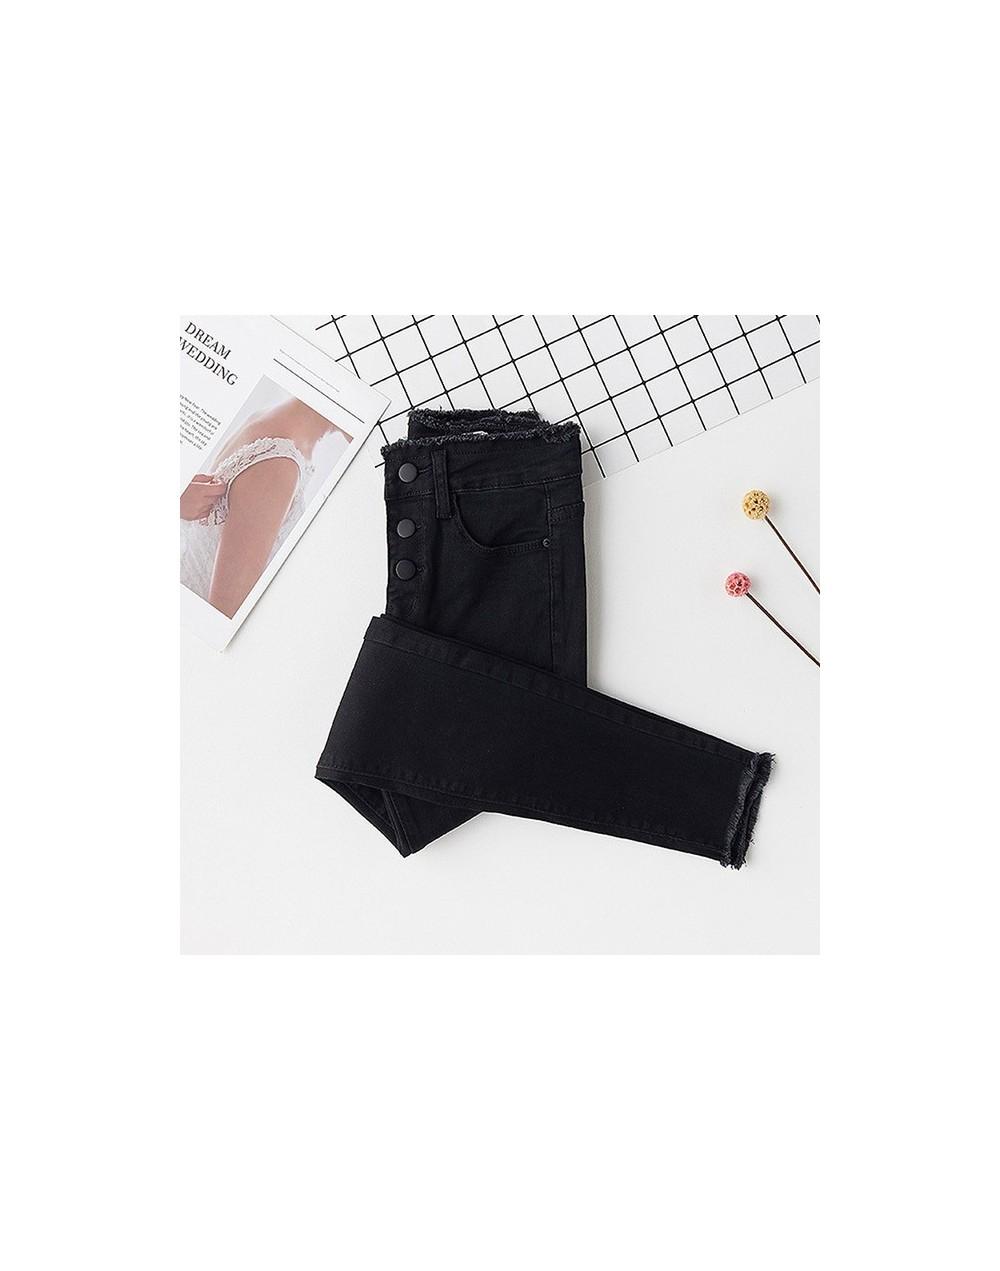 Streetwear High Waist Ripped Skinny Jeans Woman Plus Size Gray Black Stretch Mom jeans Ladies women jeans pants jeans femme ...